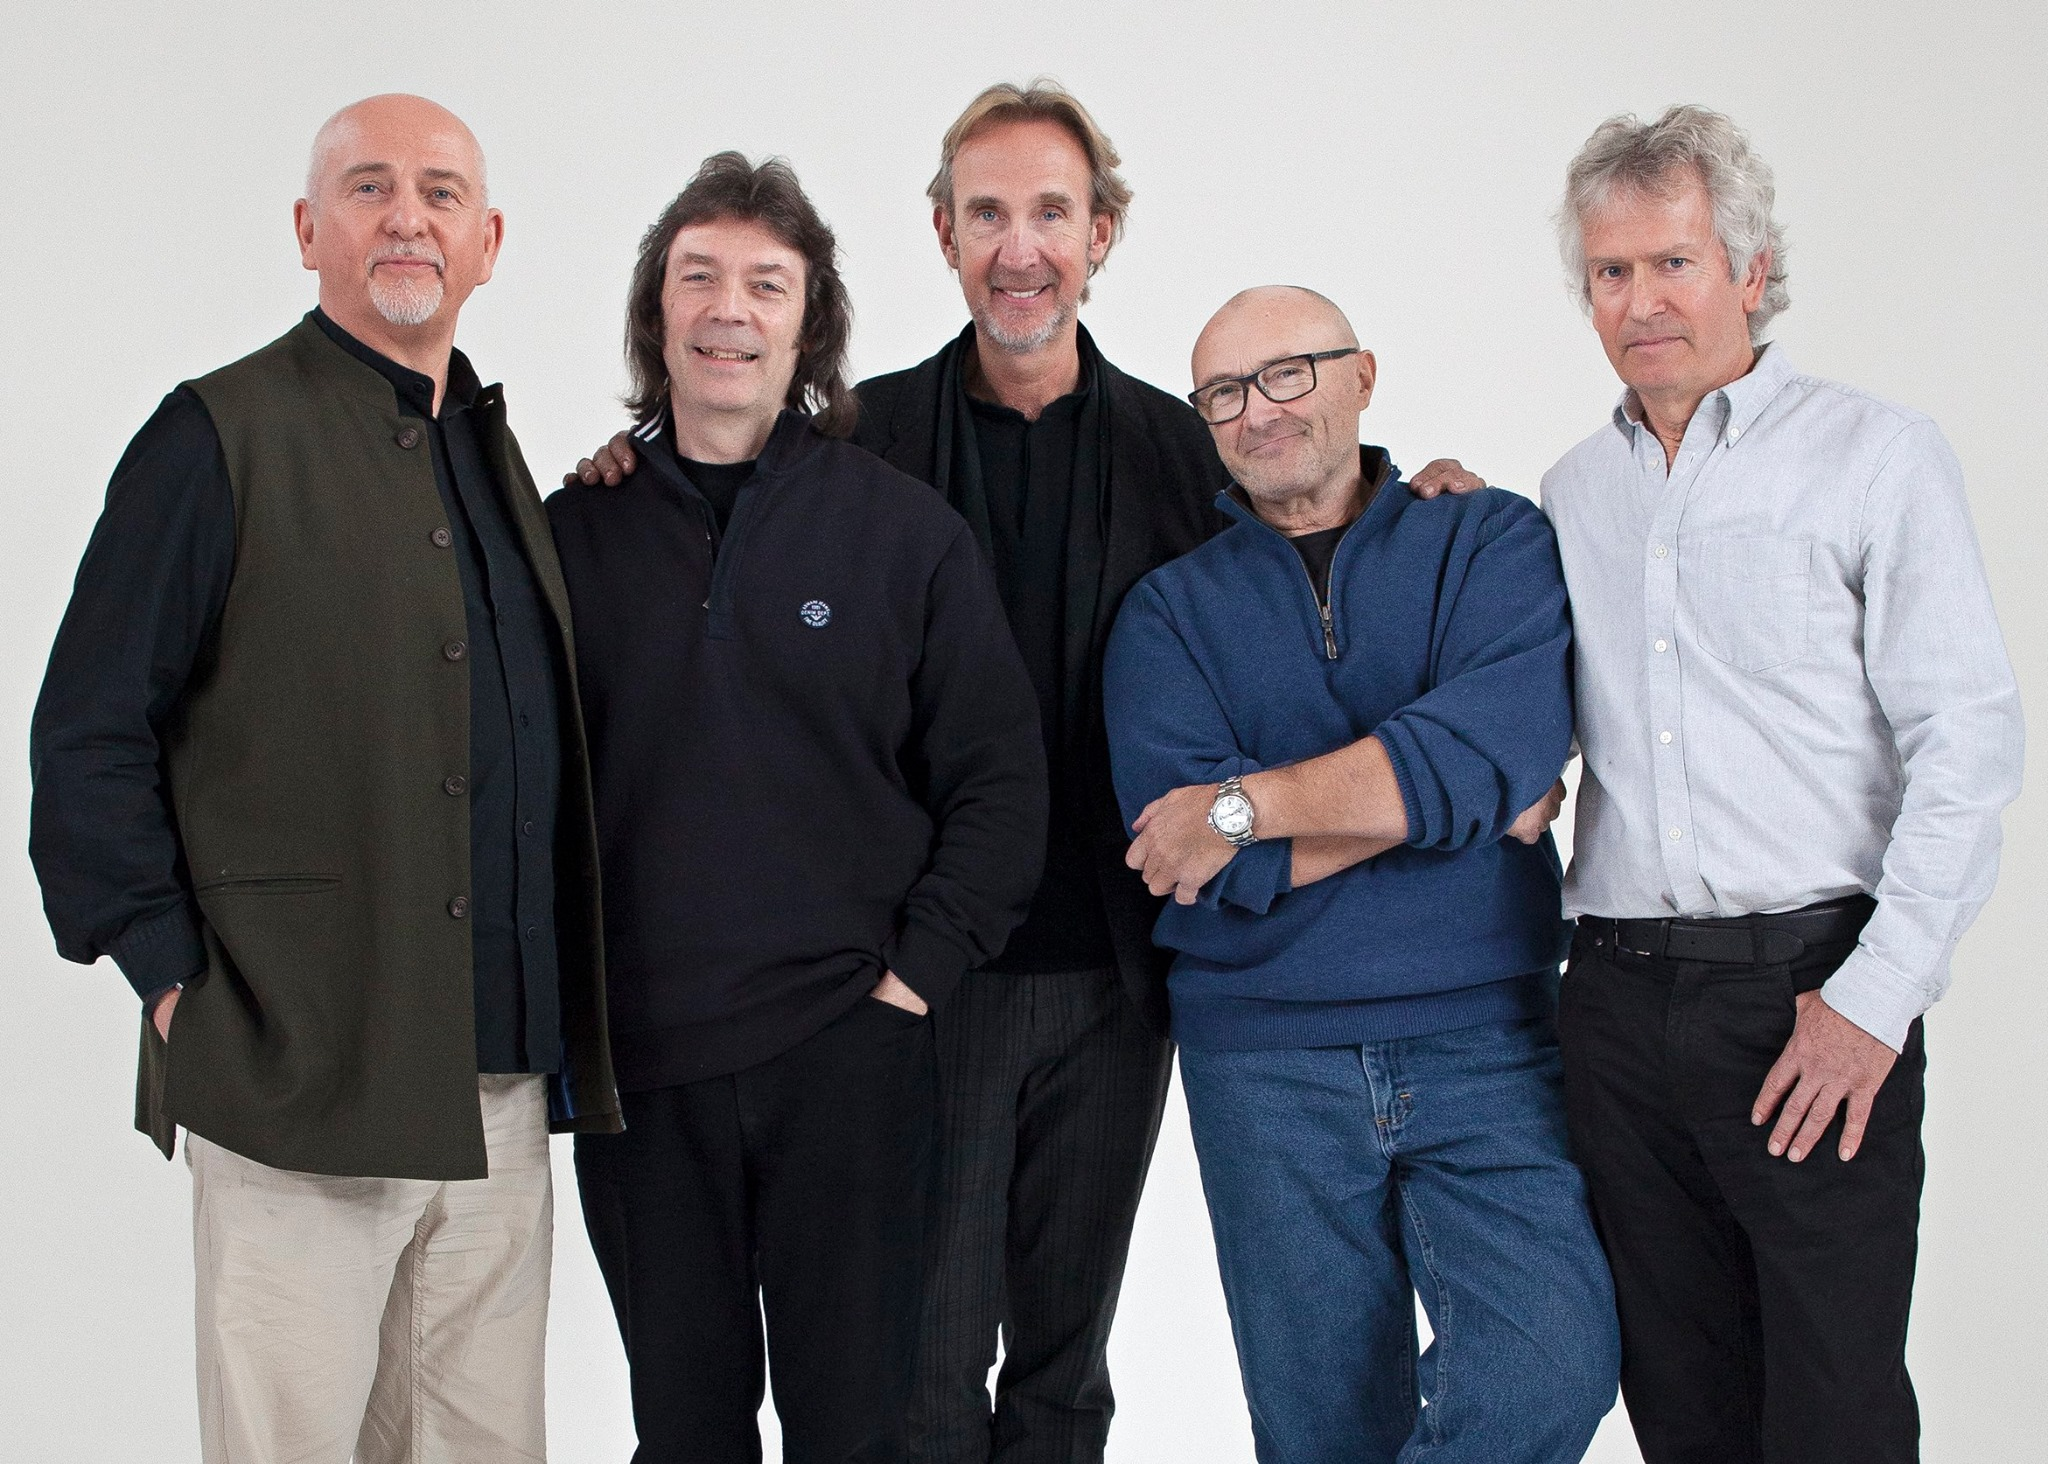 Genesis at BBC - Phil Collins